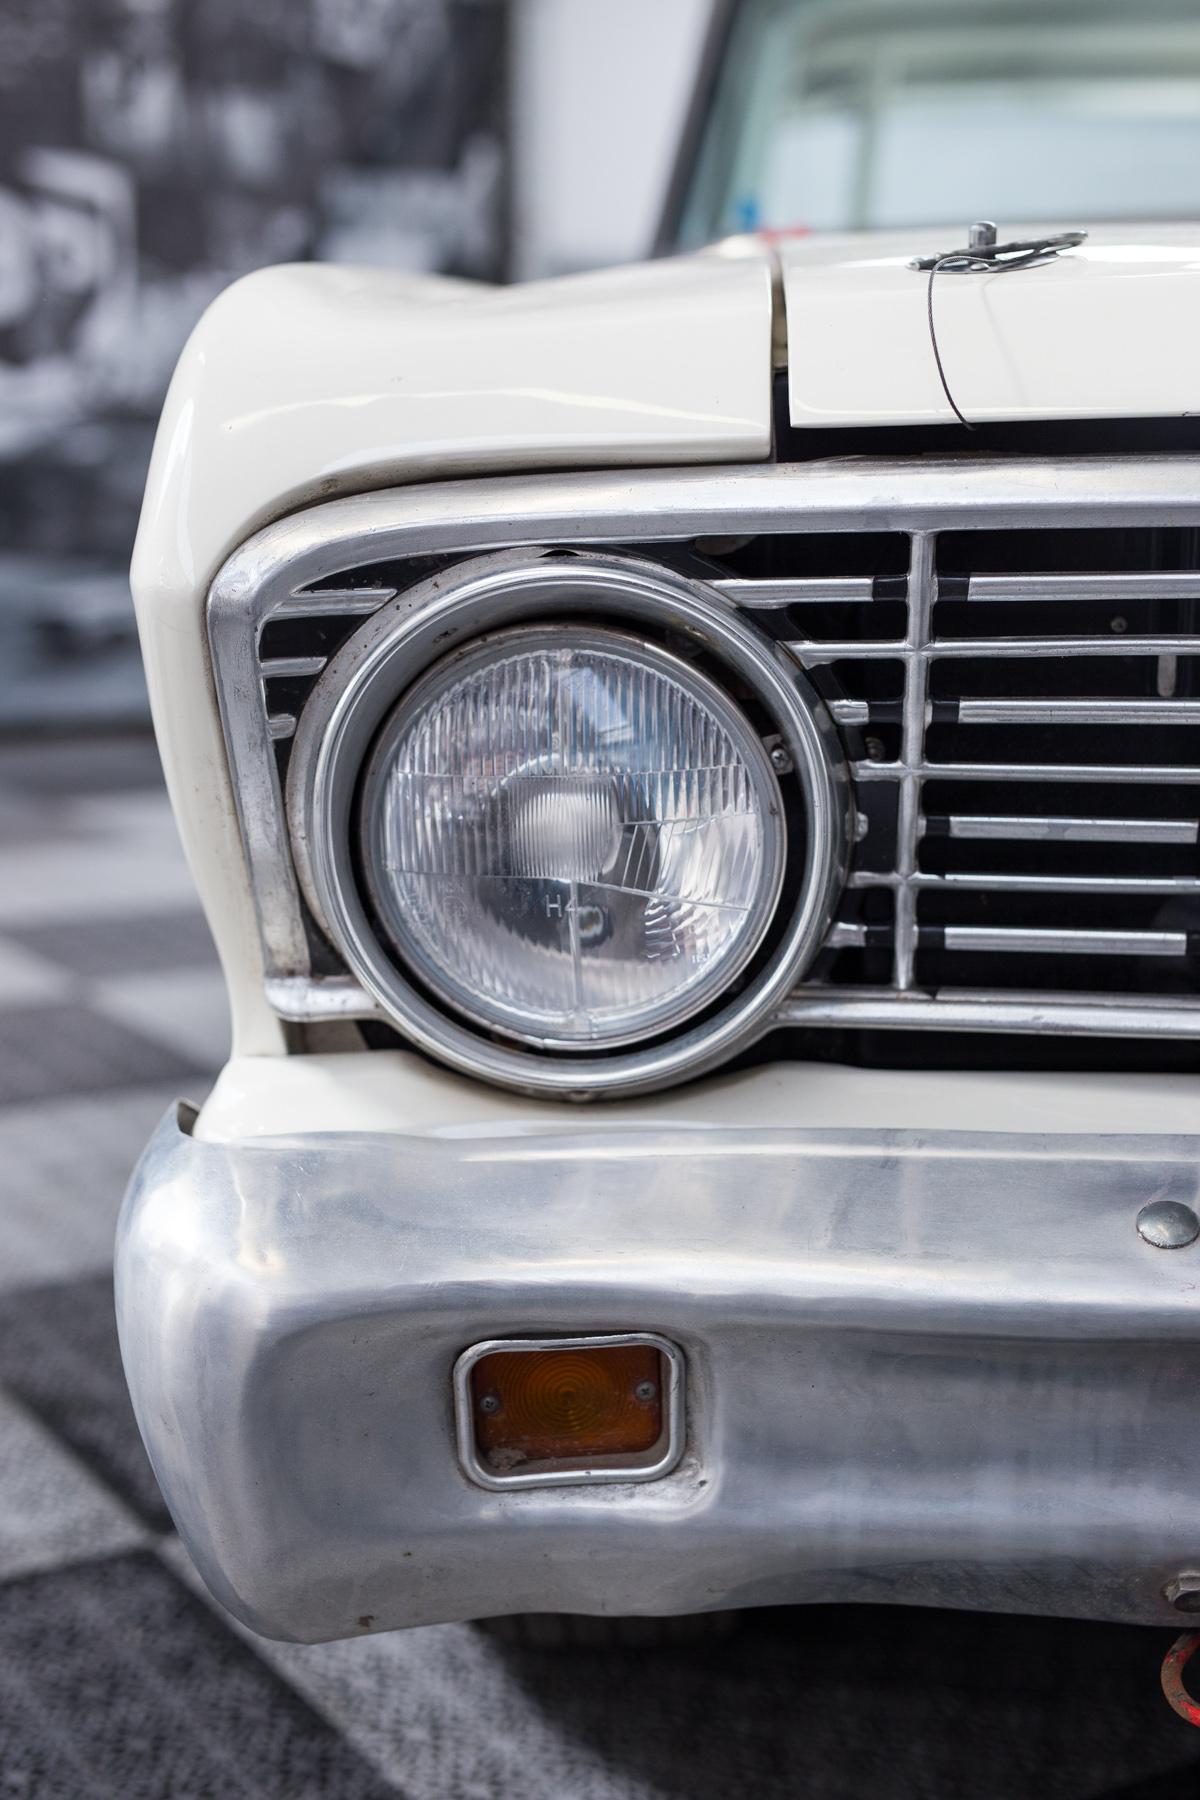 1964 Ford Falcon Sprint Fia Appendix K Race Car Performed In Short